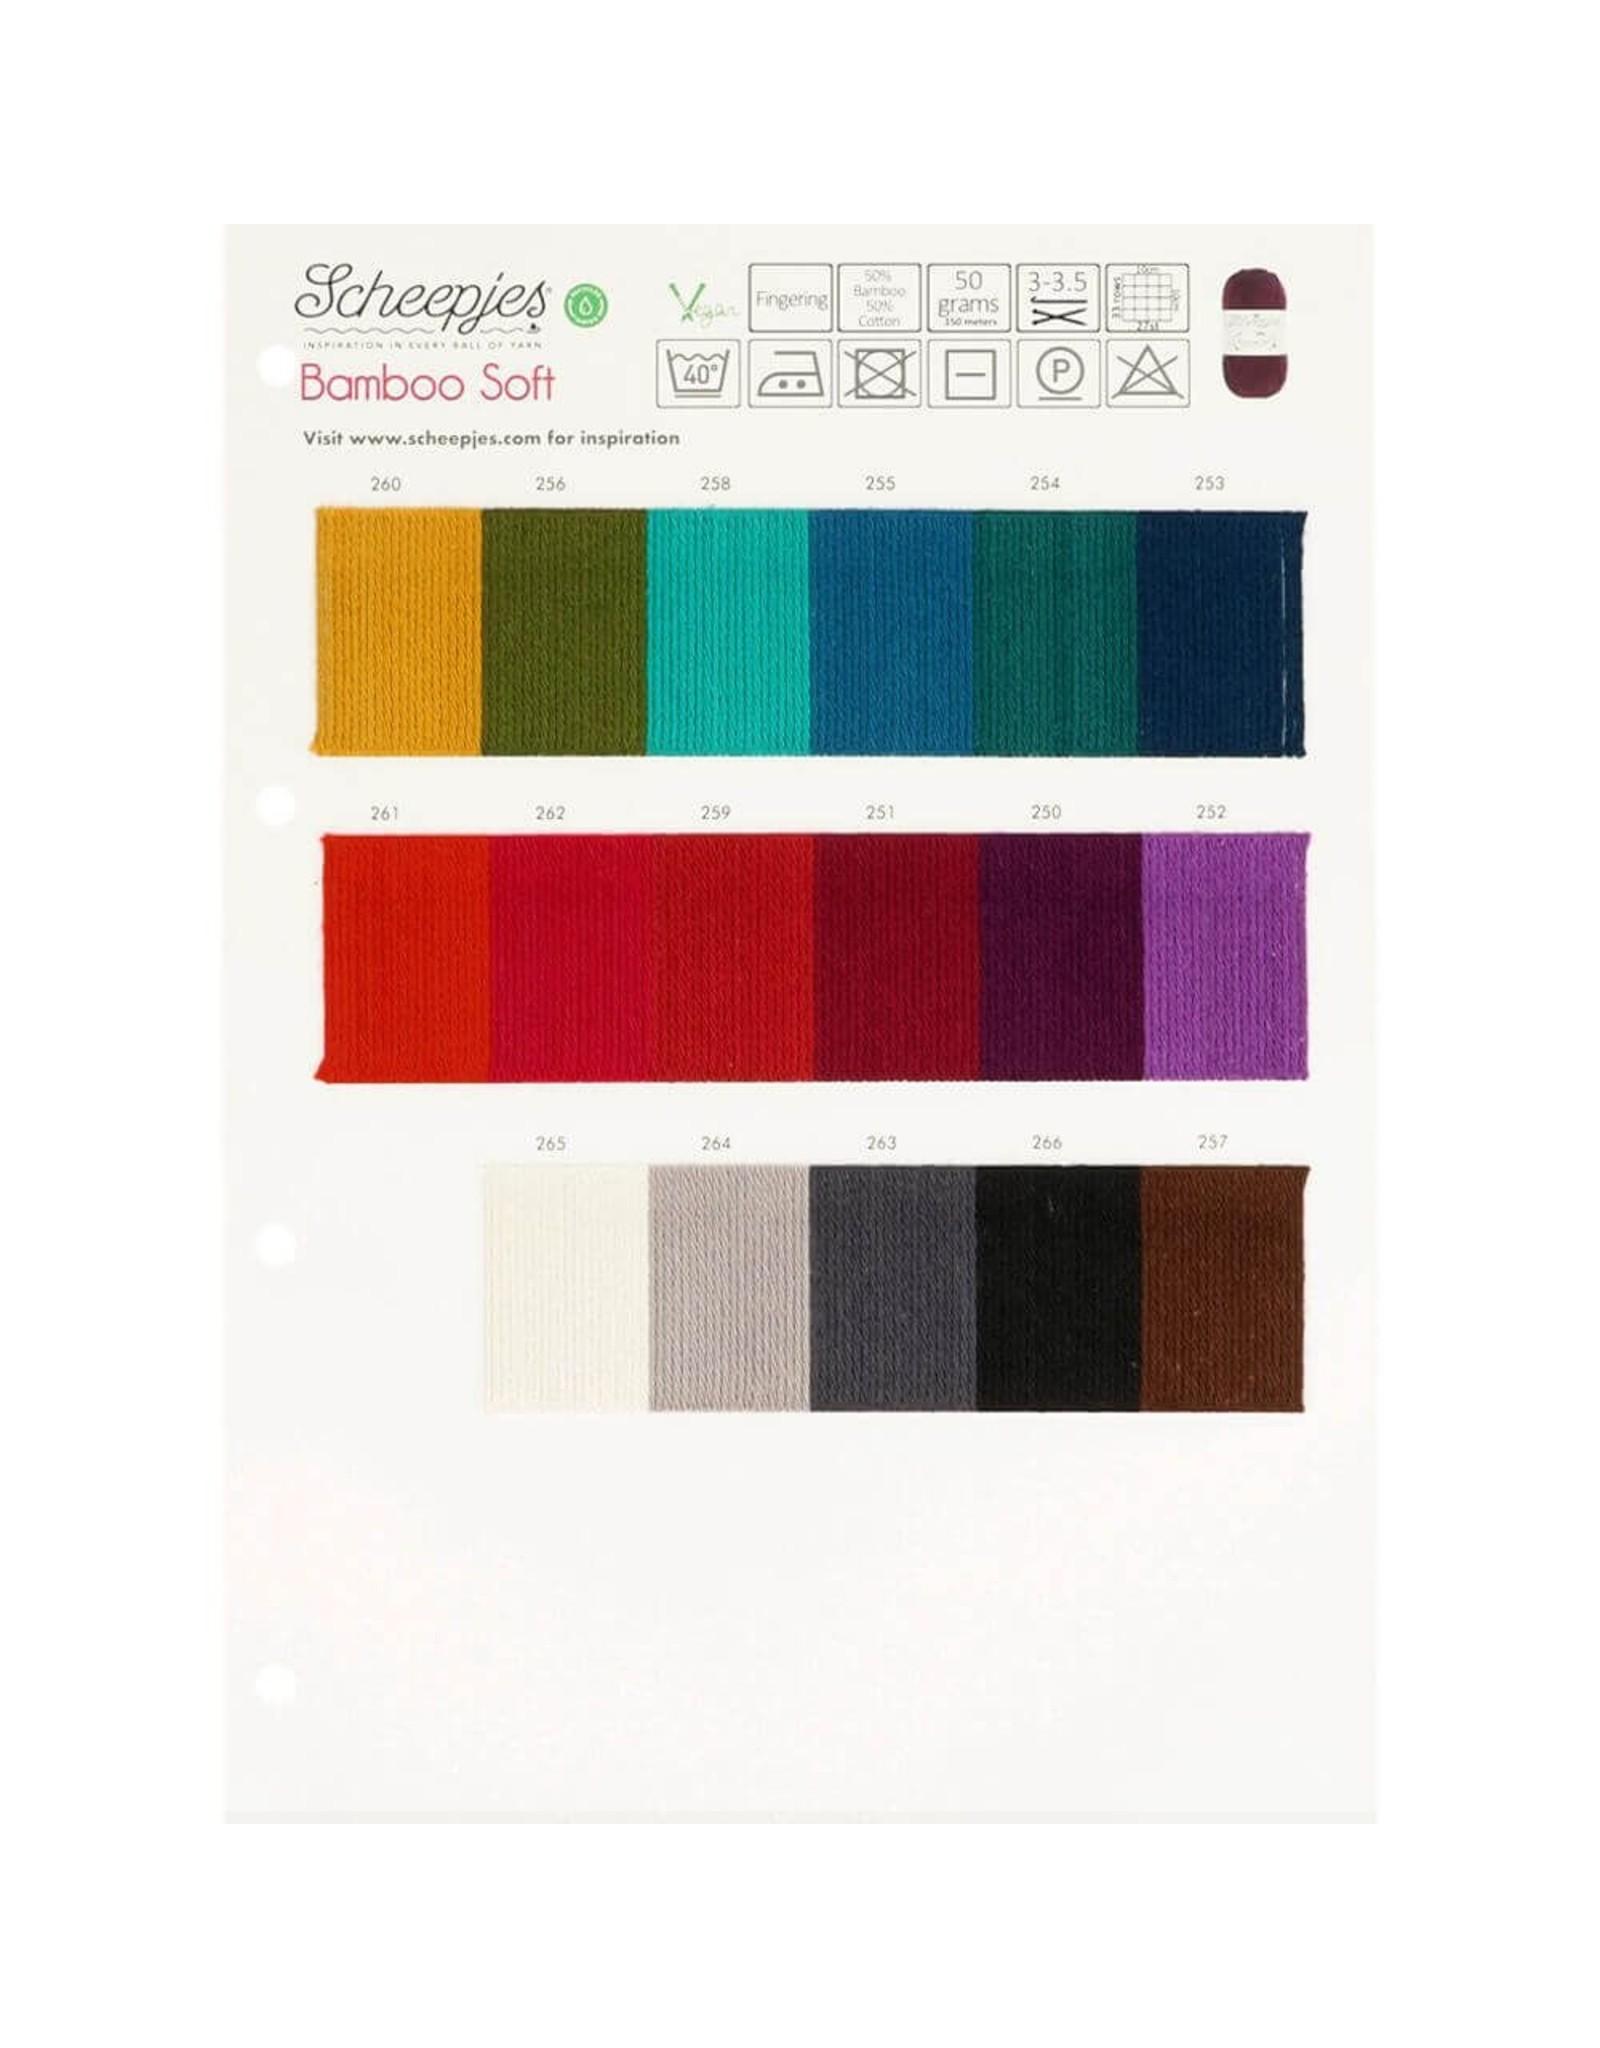 Scheepjes Scheepjes Bamboo Soft Stalenkaart